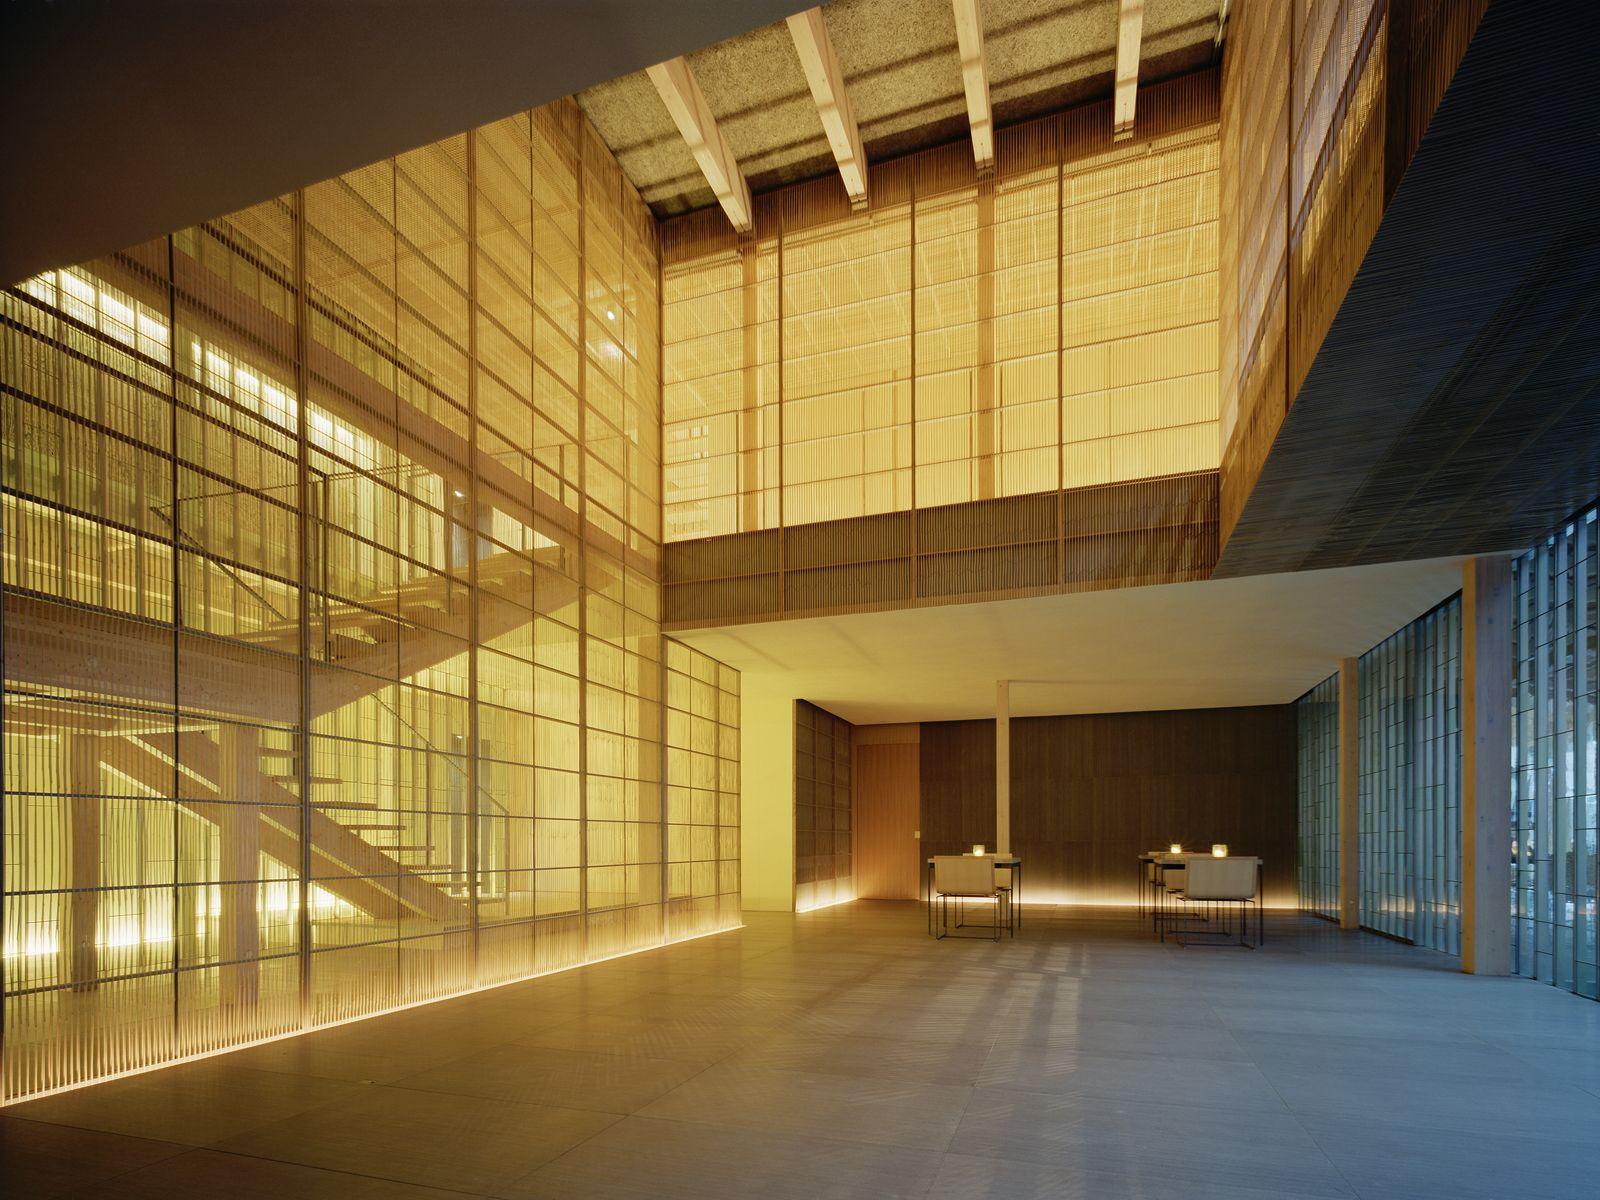 Ginzan Onsen Fujiya . Kengo Kuma & Associates. uplighting + timber batten